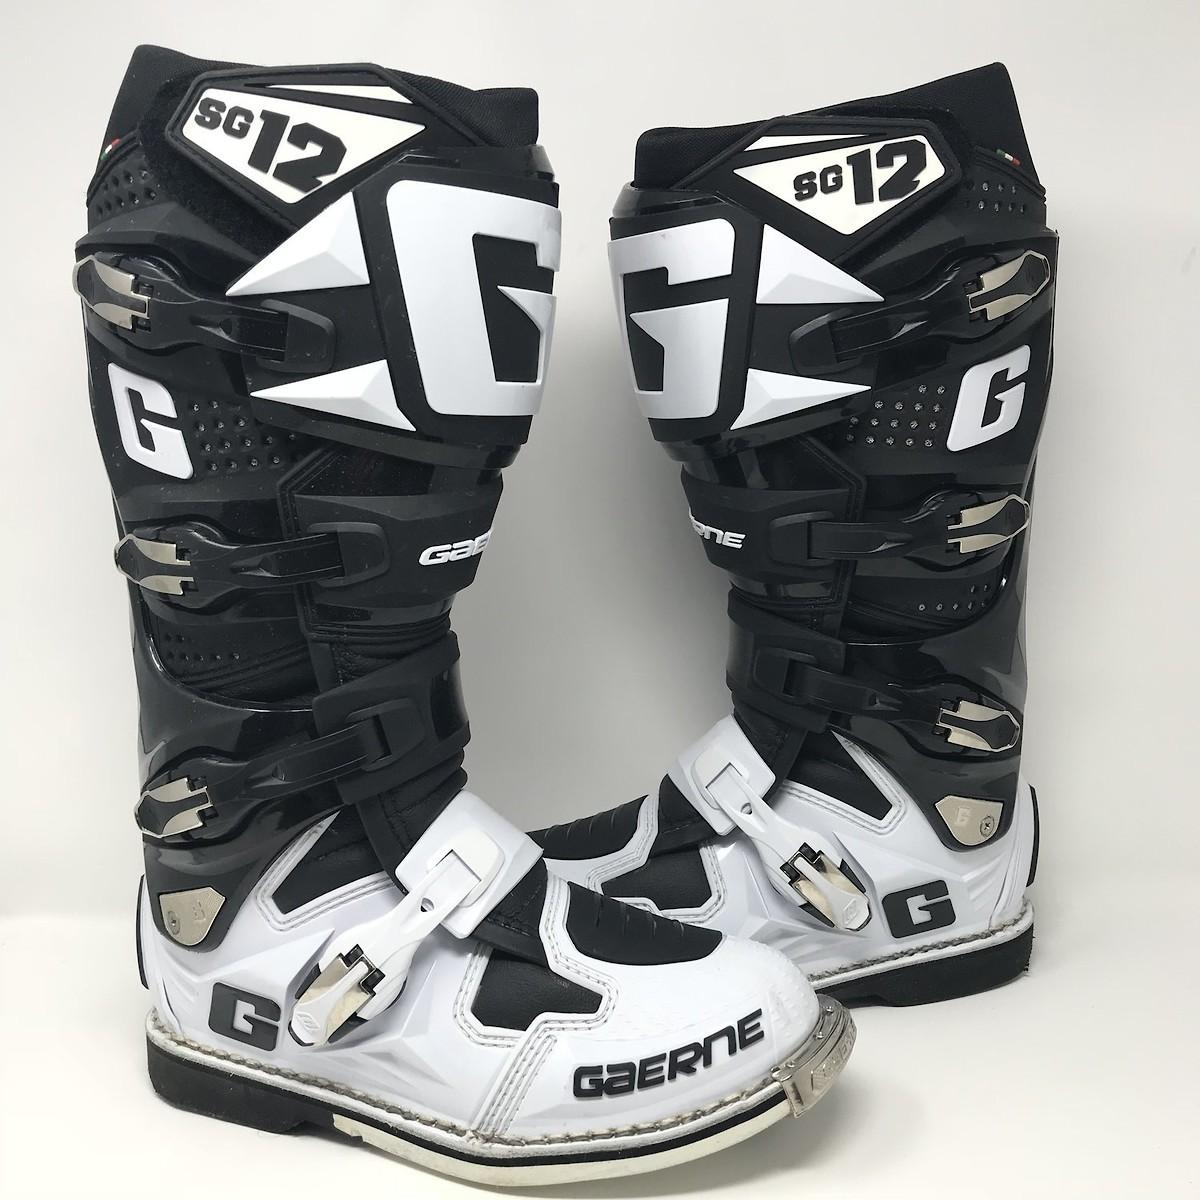 Gaerne Boots Sg12 >> Tech 10s, 2018 Fox Instincts, Gaerne SG12, Suomy Helmet - For Sale/Bazaar - Motocross Forums ...